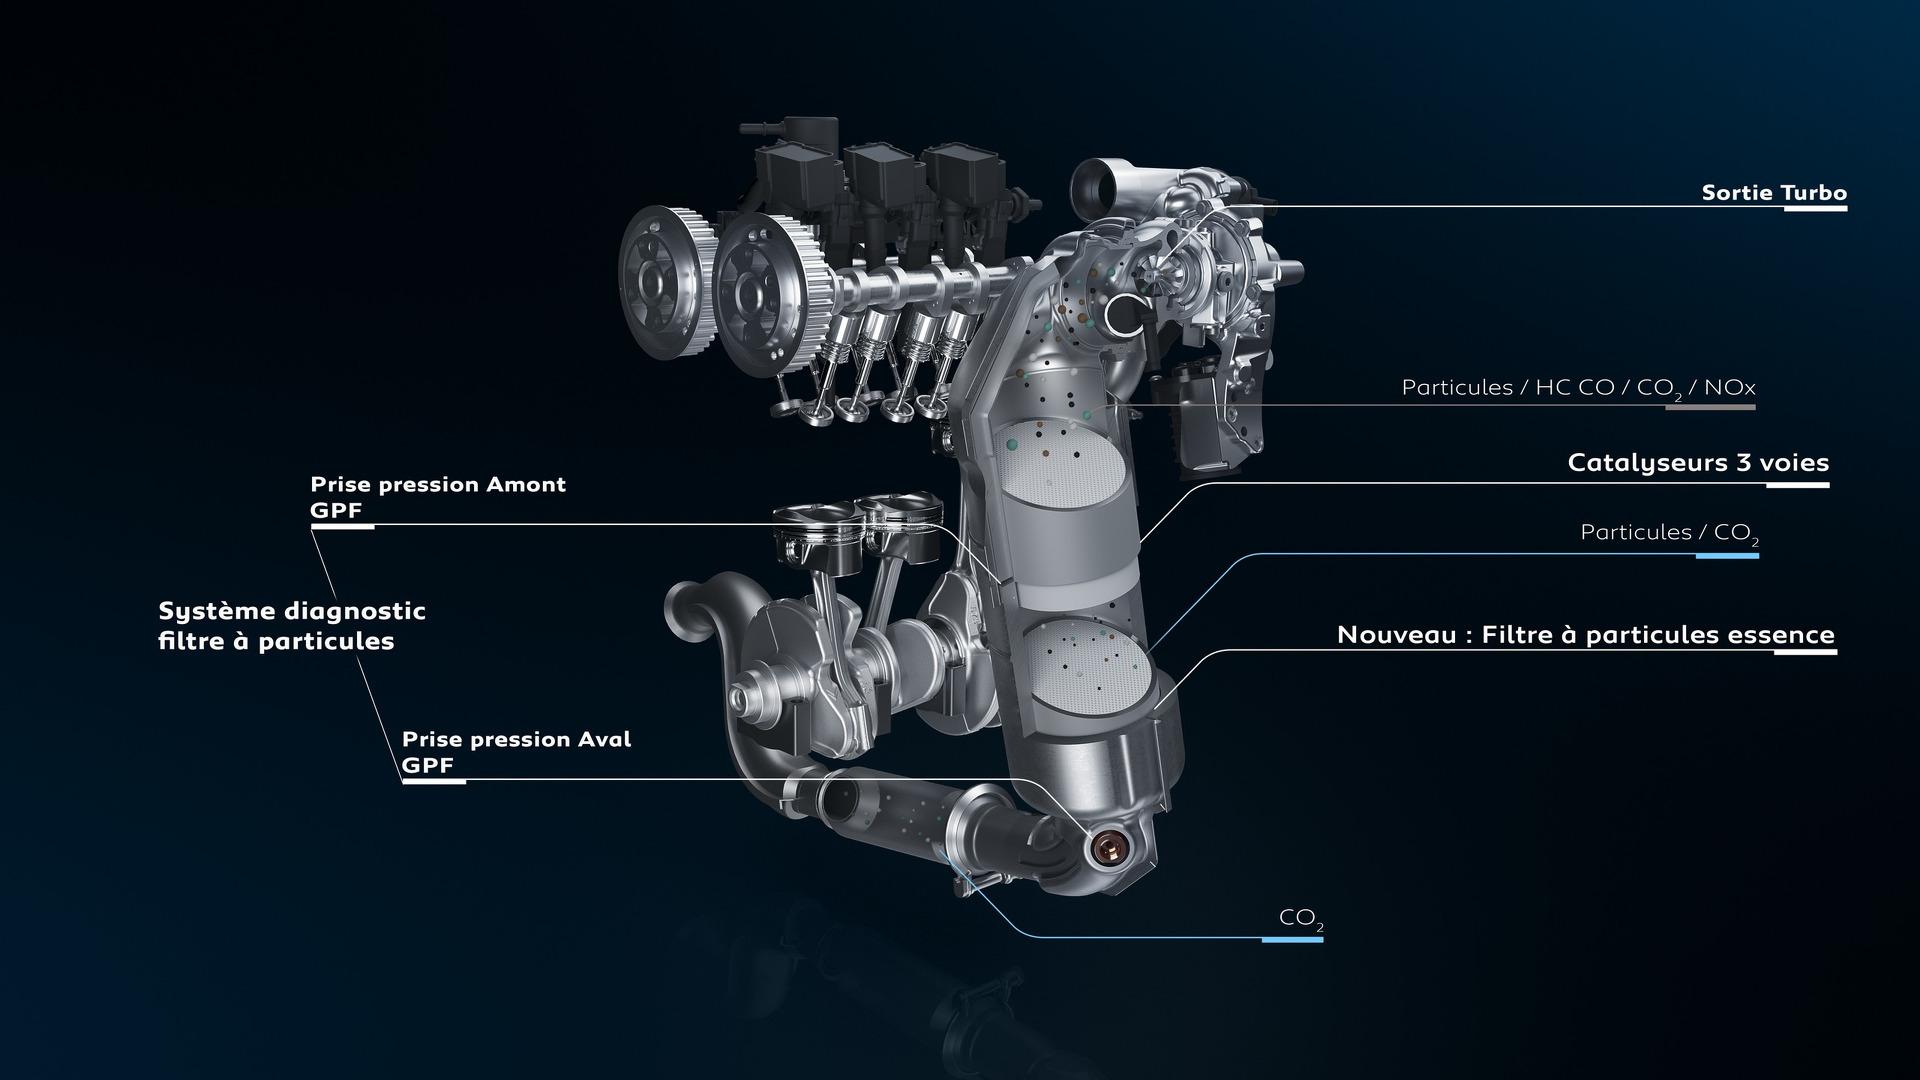 2018-peugeot-308-facelift (4)